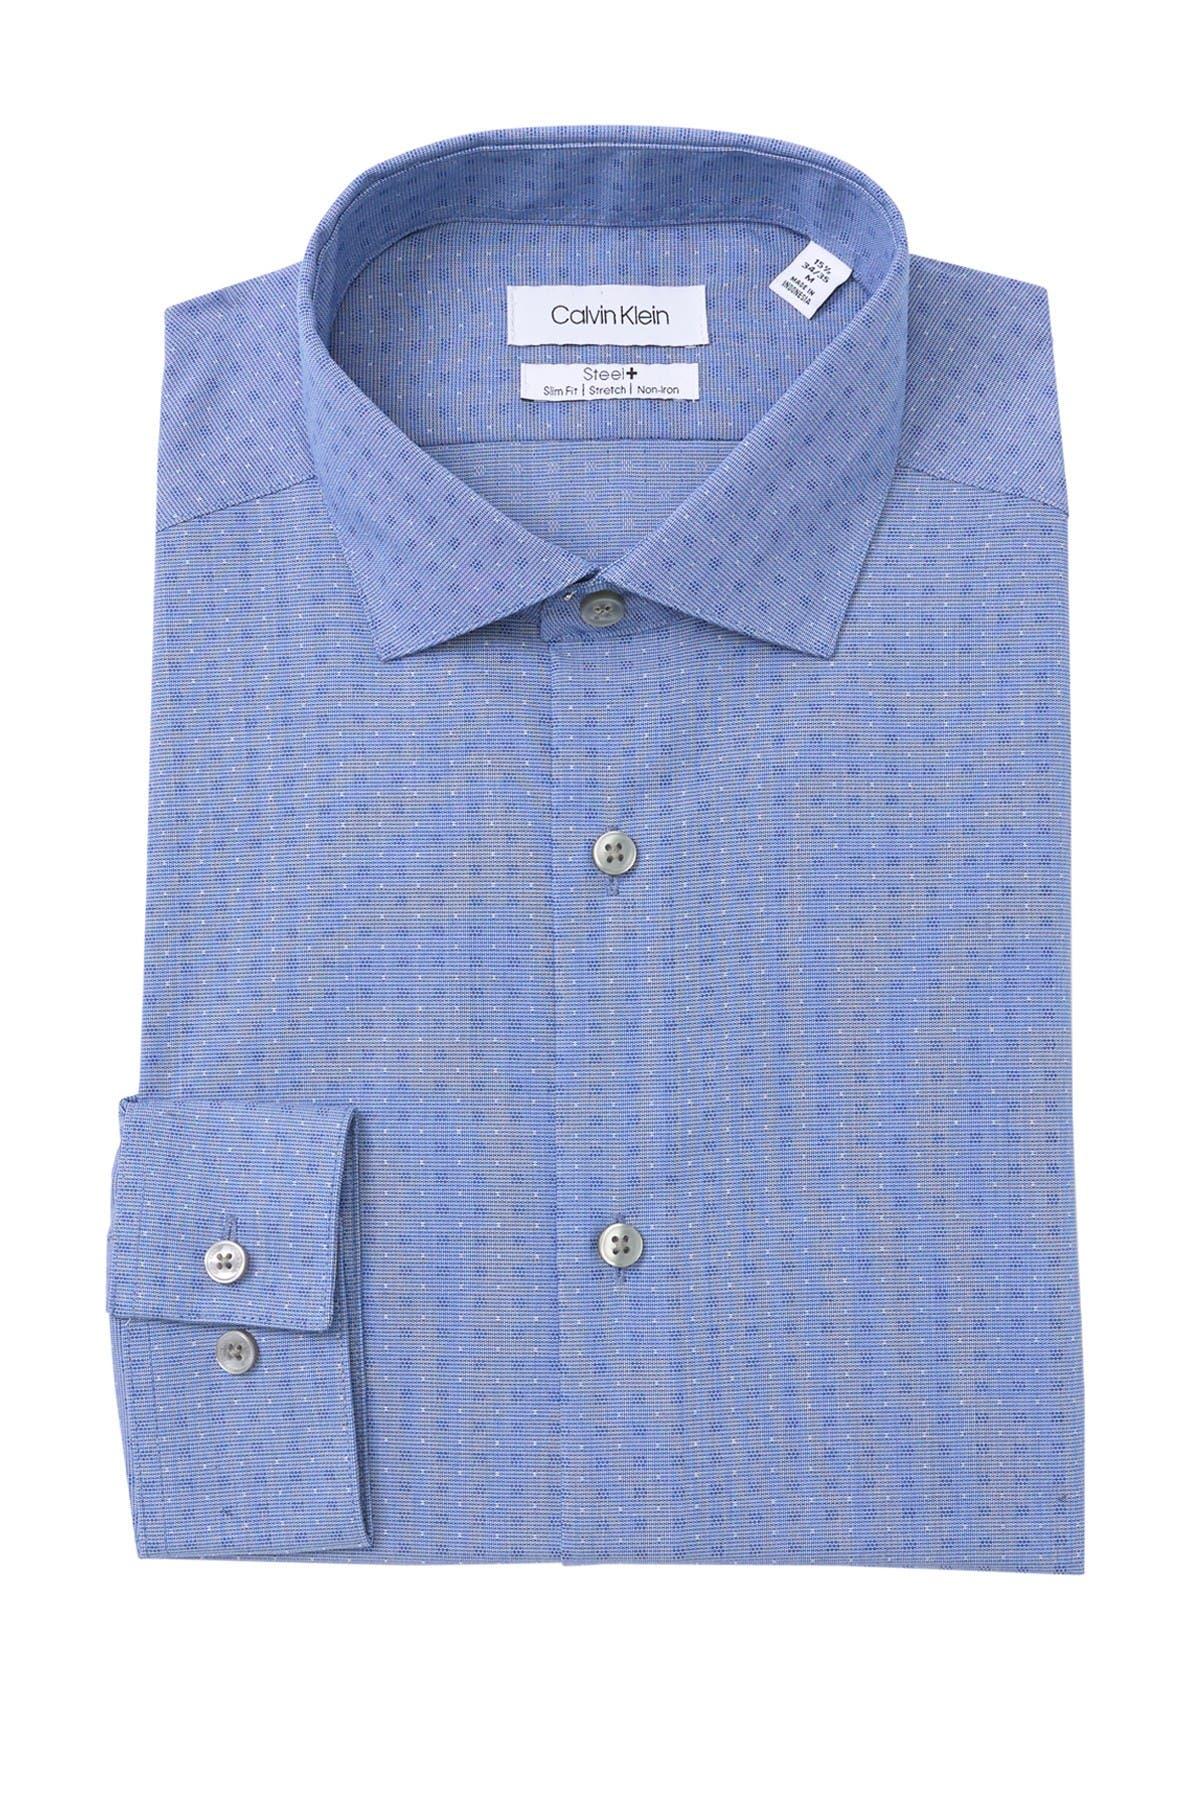 Image of Calvin Klein Slim Fit Non-Iron Stretch Dress Shirt